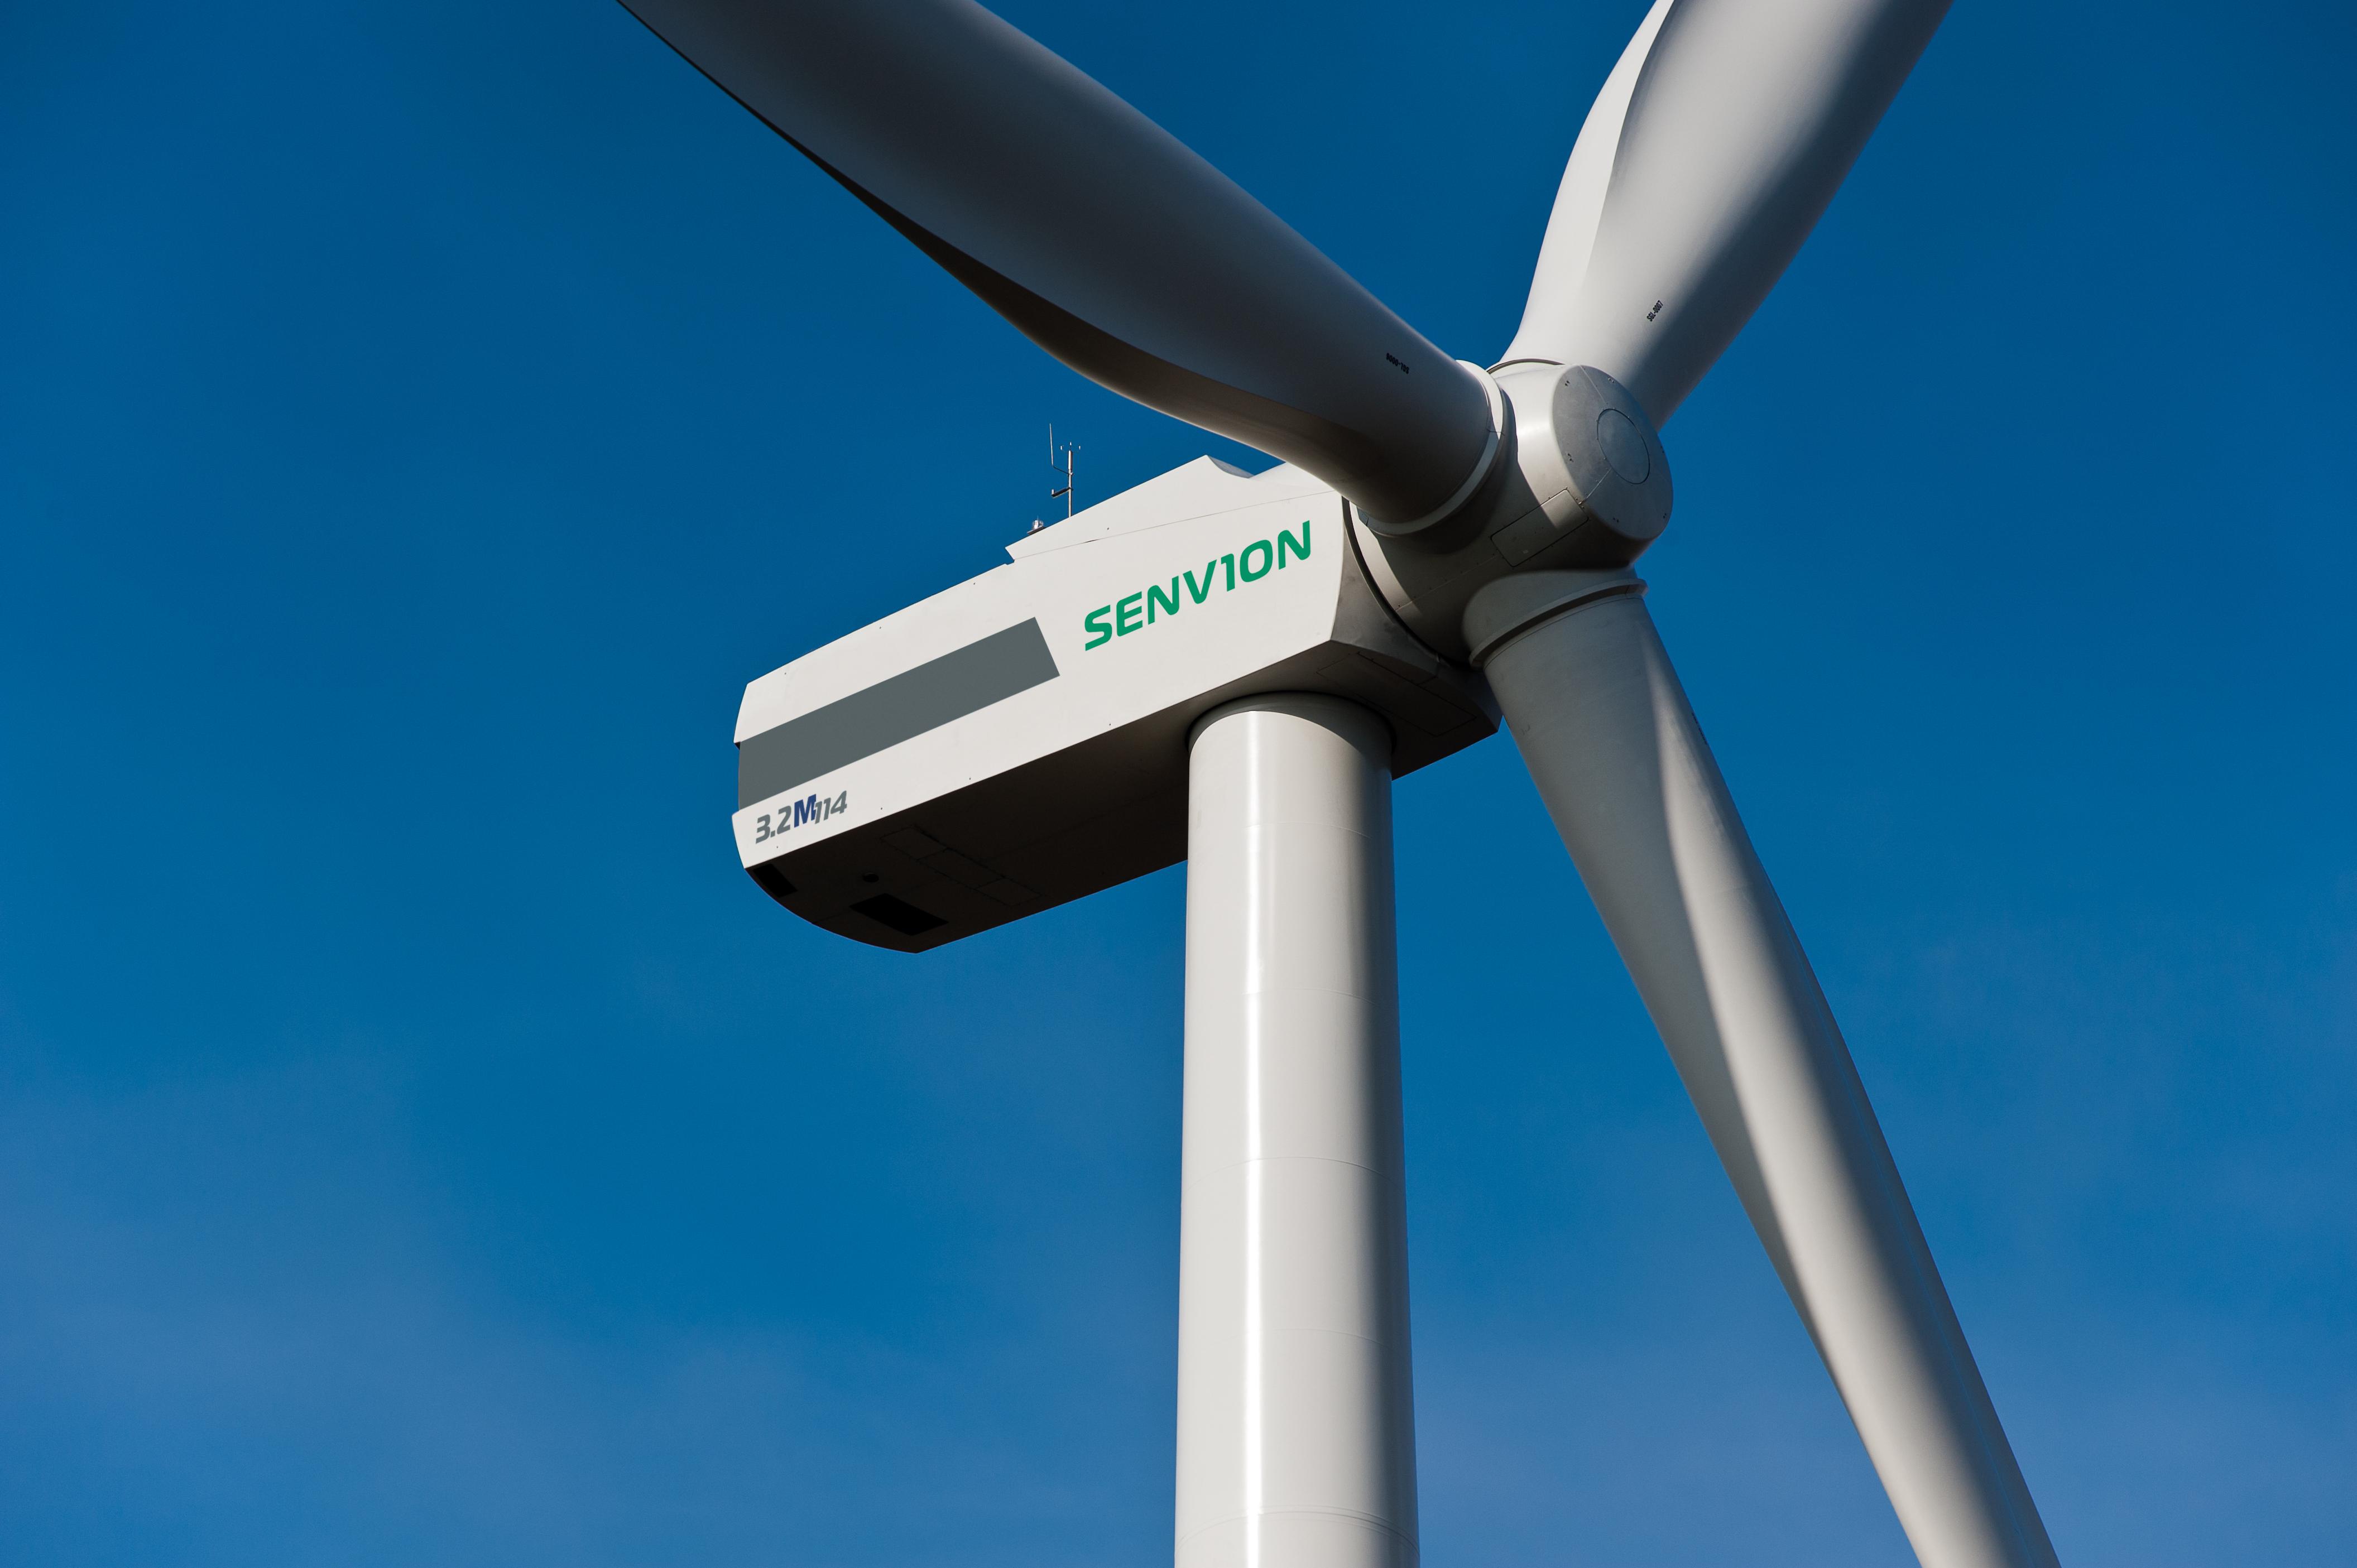 UMertens_120303_688_St_Michaelisdorn_RGB_Senv_3.2M114 Senvion Sets New IPO Price Of EUR 15.75 Per Share